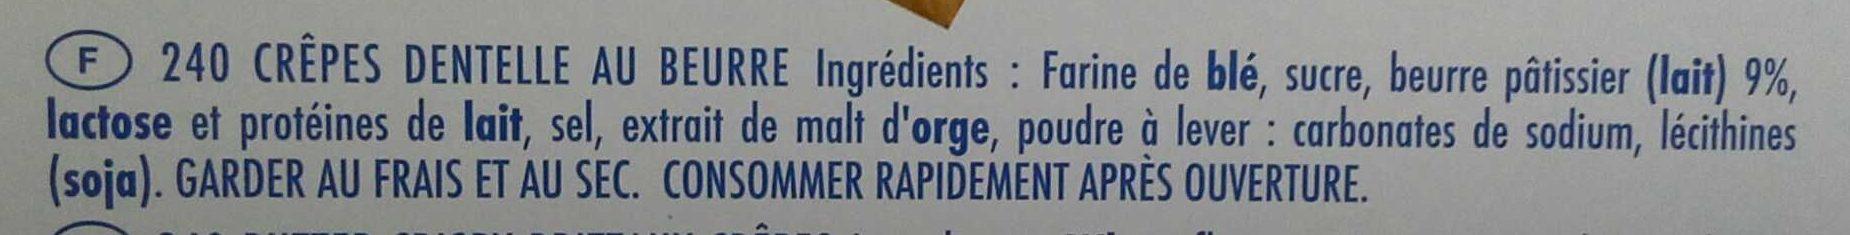 Crêpe Dentelle - Ingrediënten - fr